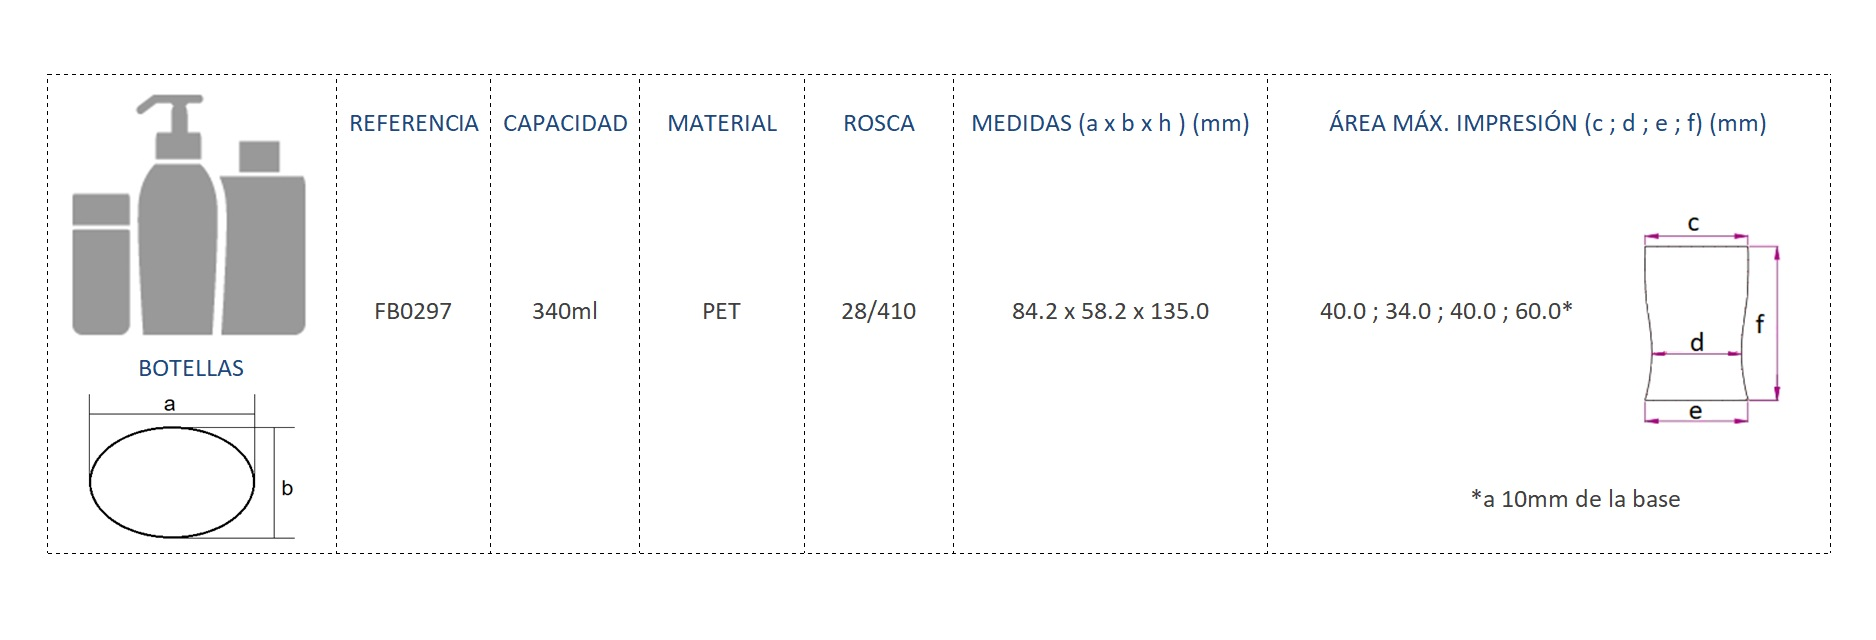 Cuadro de materiales botella FB0297